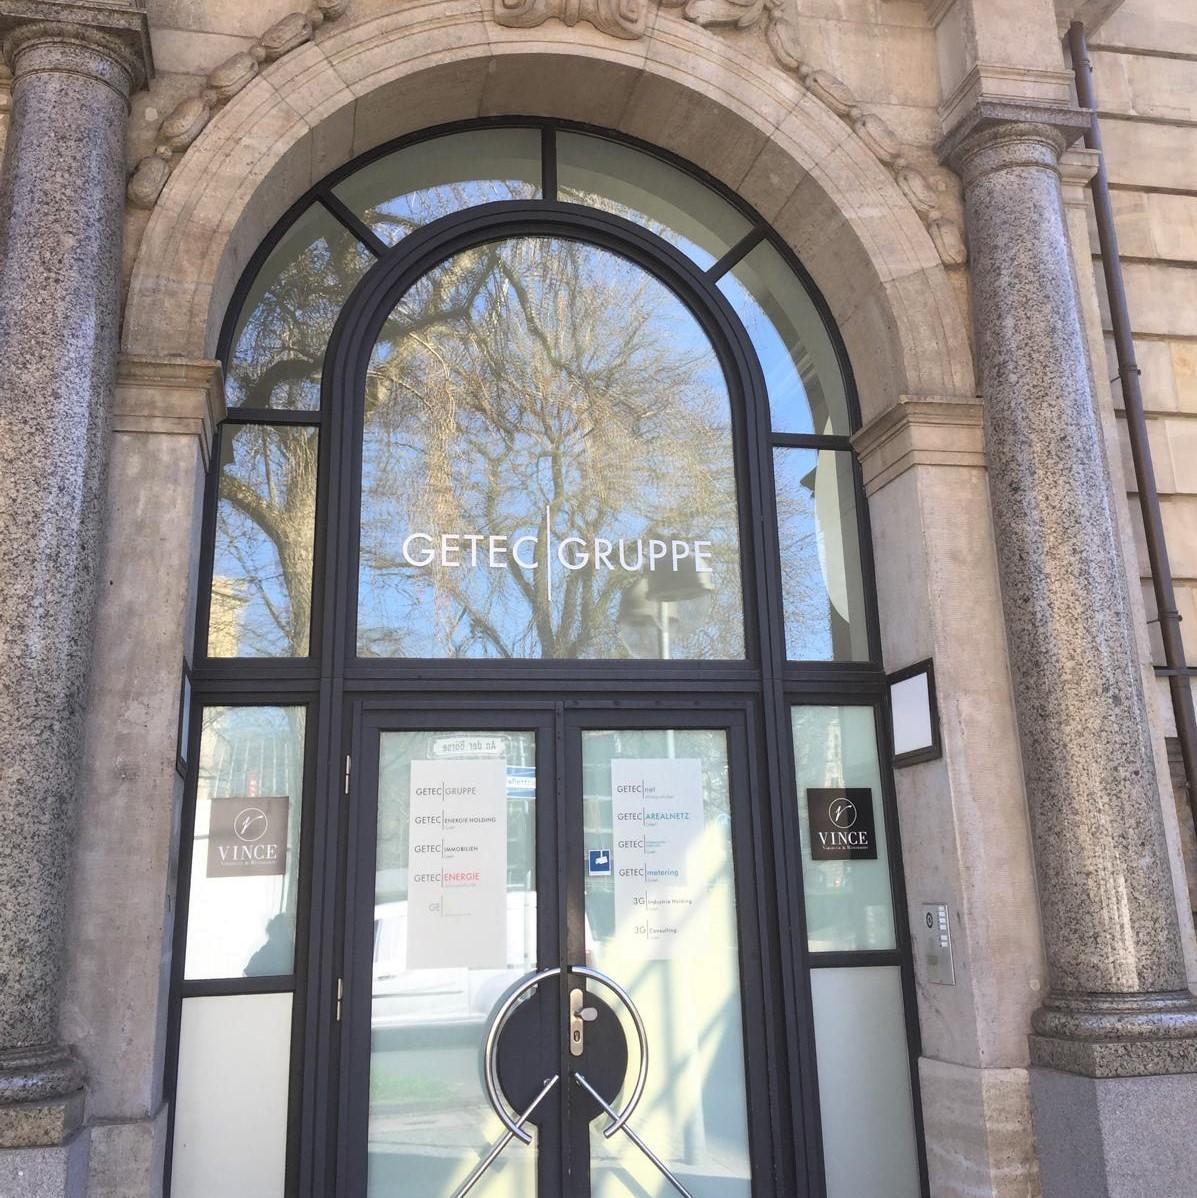 style hannover vince 1 - VINCE: Bankfiliale mutiert zur Vinoteca